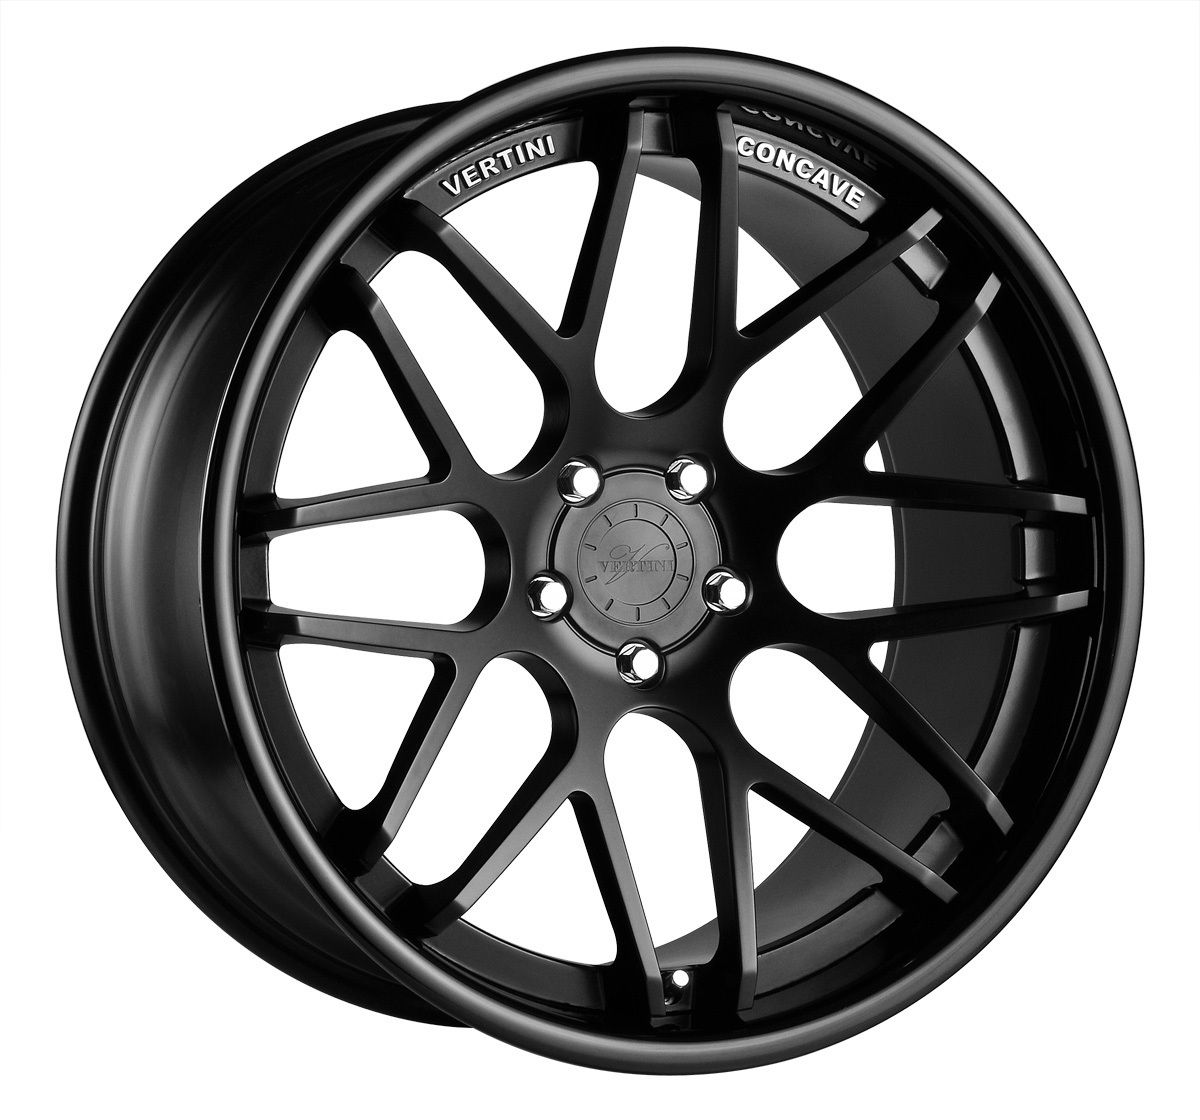 22 Vertini Magic Black Rims Wheels Chevrolet Chevy Camaro LS Lt